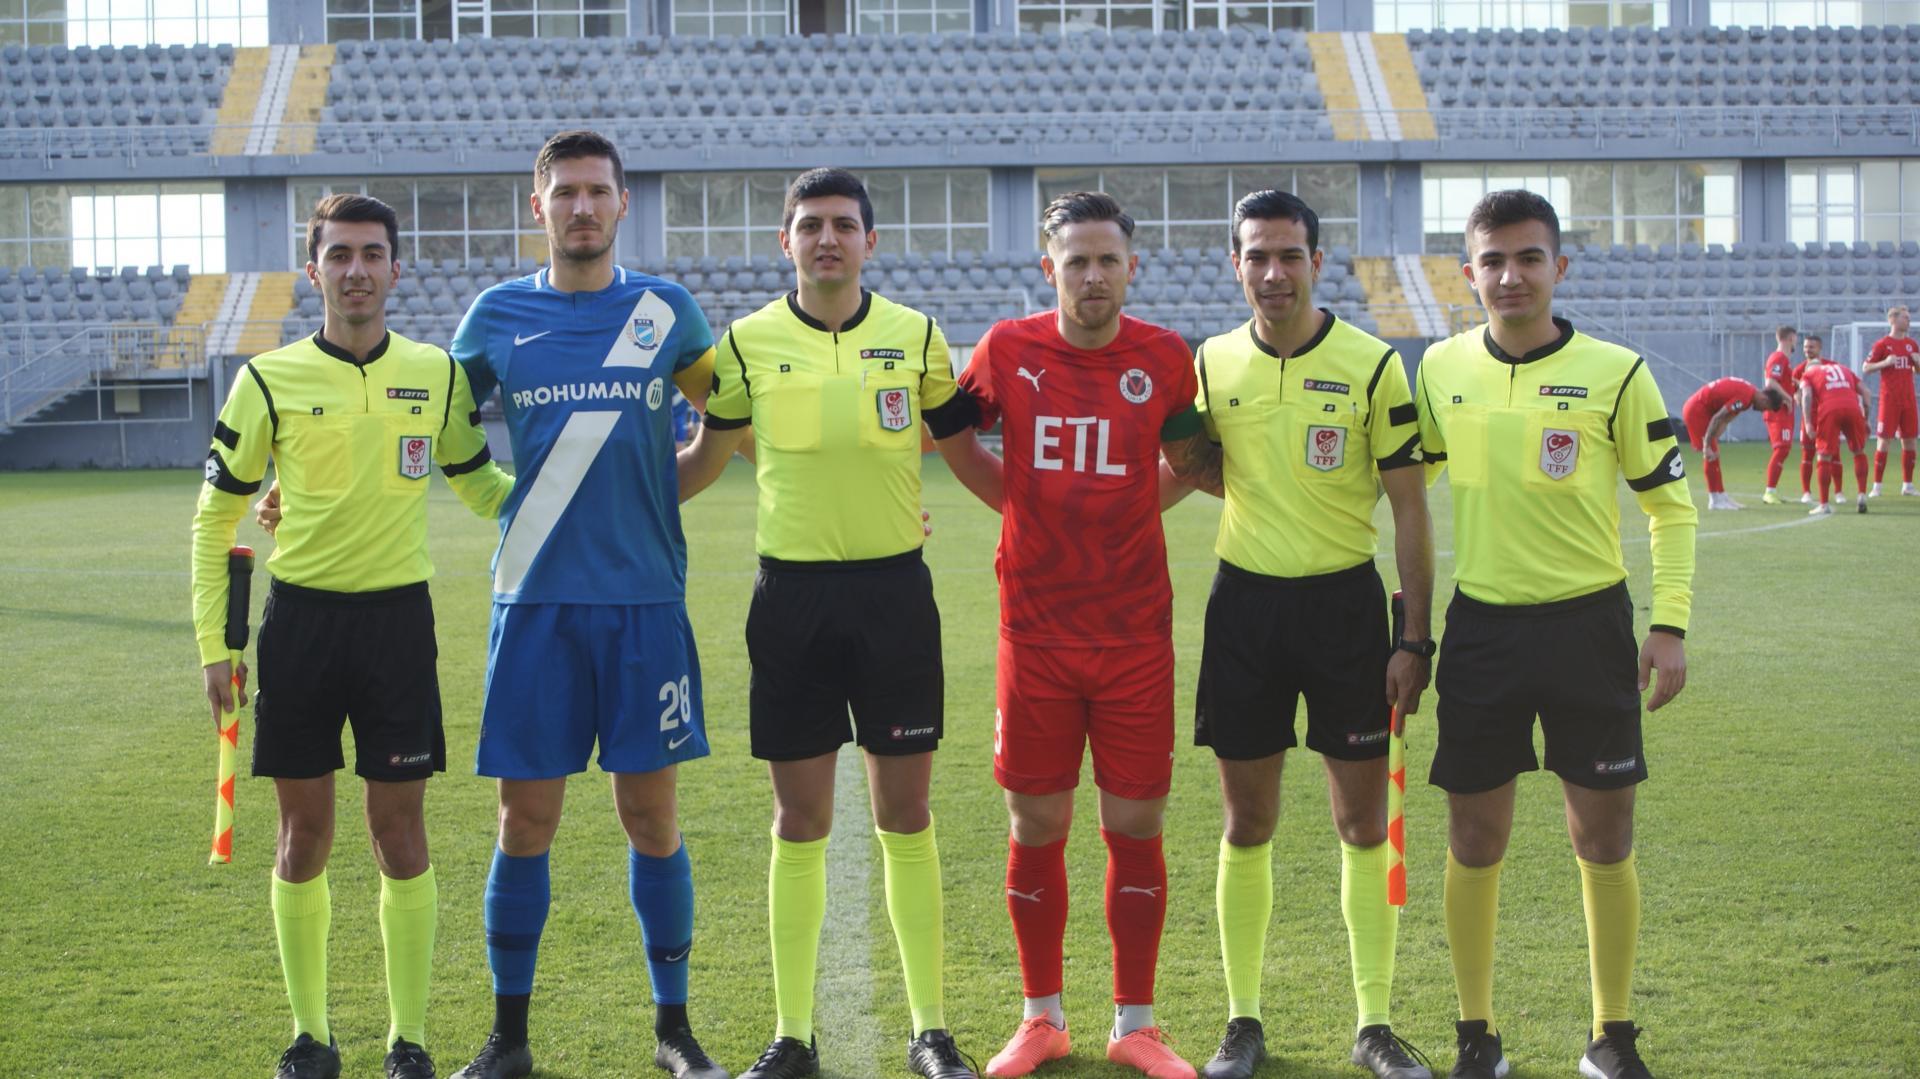 MTK Budapest-FC Viktoria Köln 5-3 (VIDEÓ)